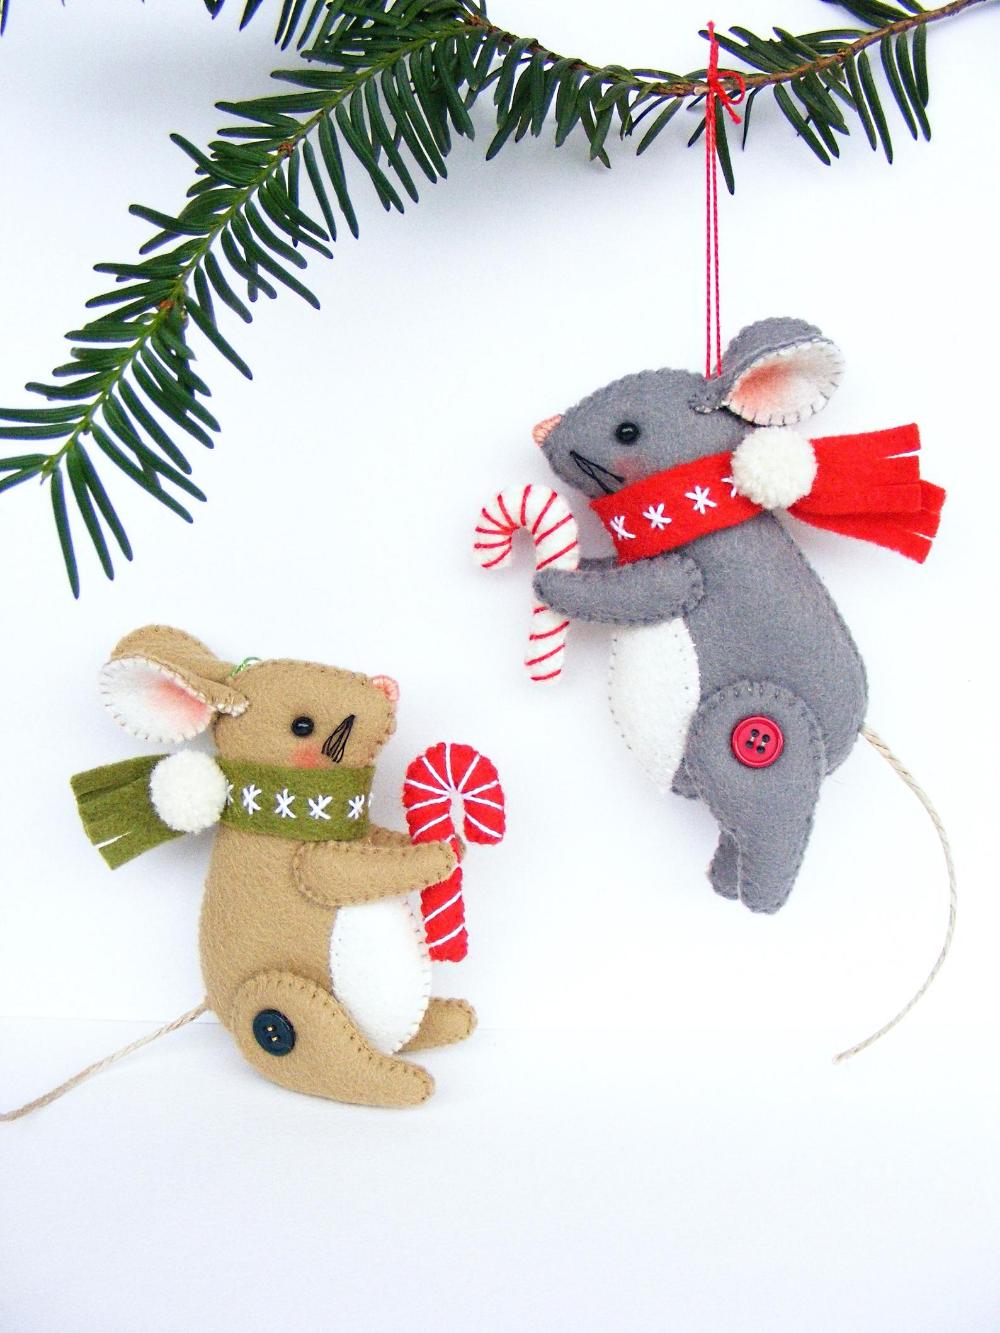 Felt Pdf Sewing Pattern Christmas Mouse Christmas Etsy Handmade Felt Ornament Christmas Ornament Pattern Felt Ornaments